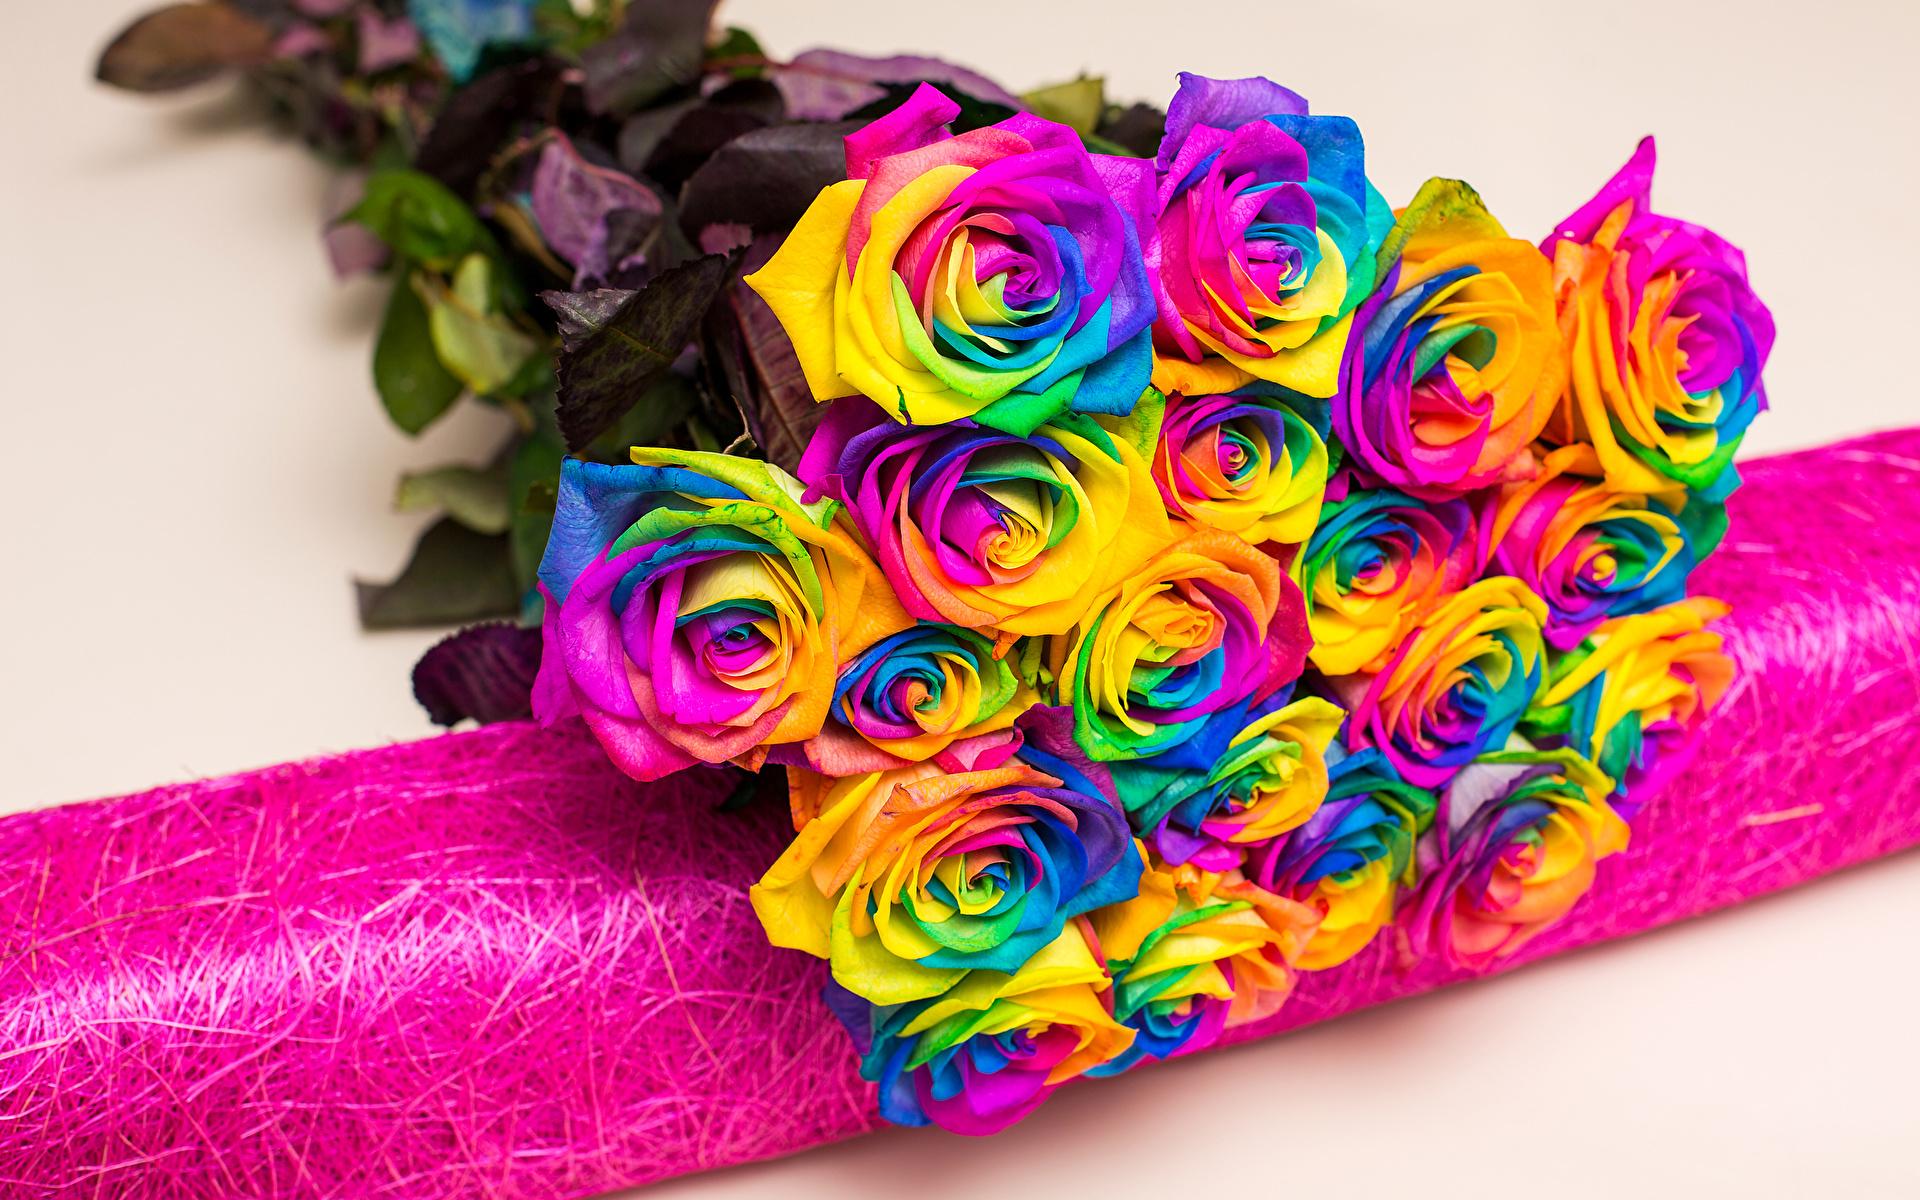 Bouquets_Roses_Multicolor_530983_1920x12